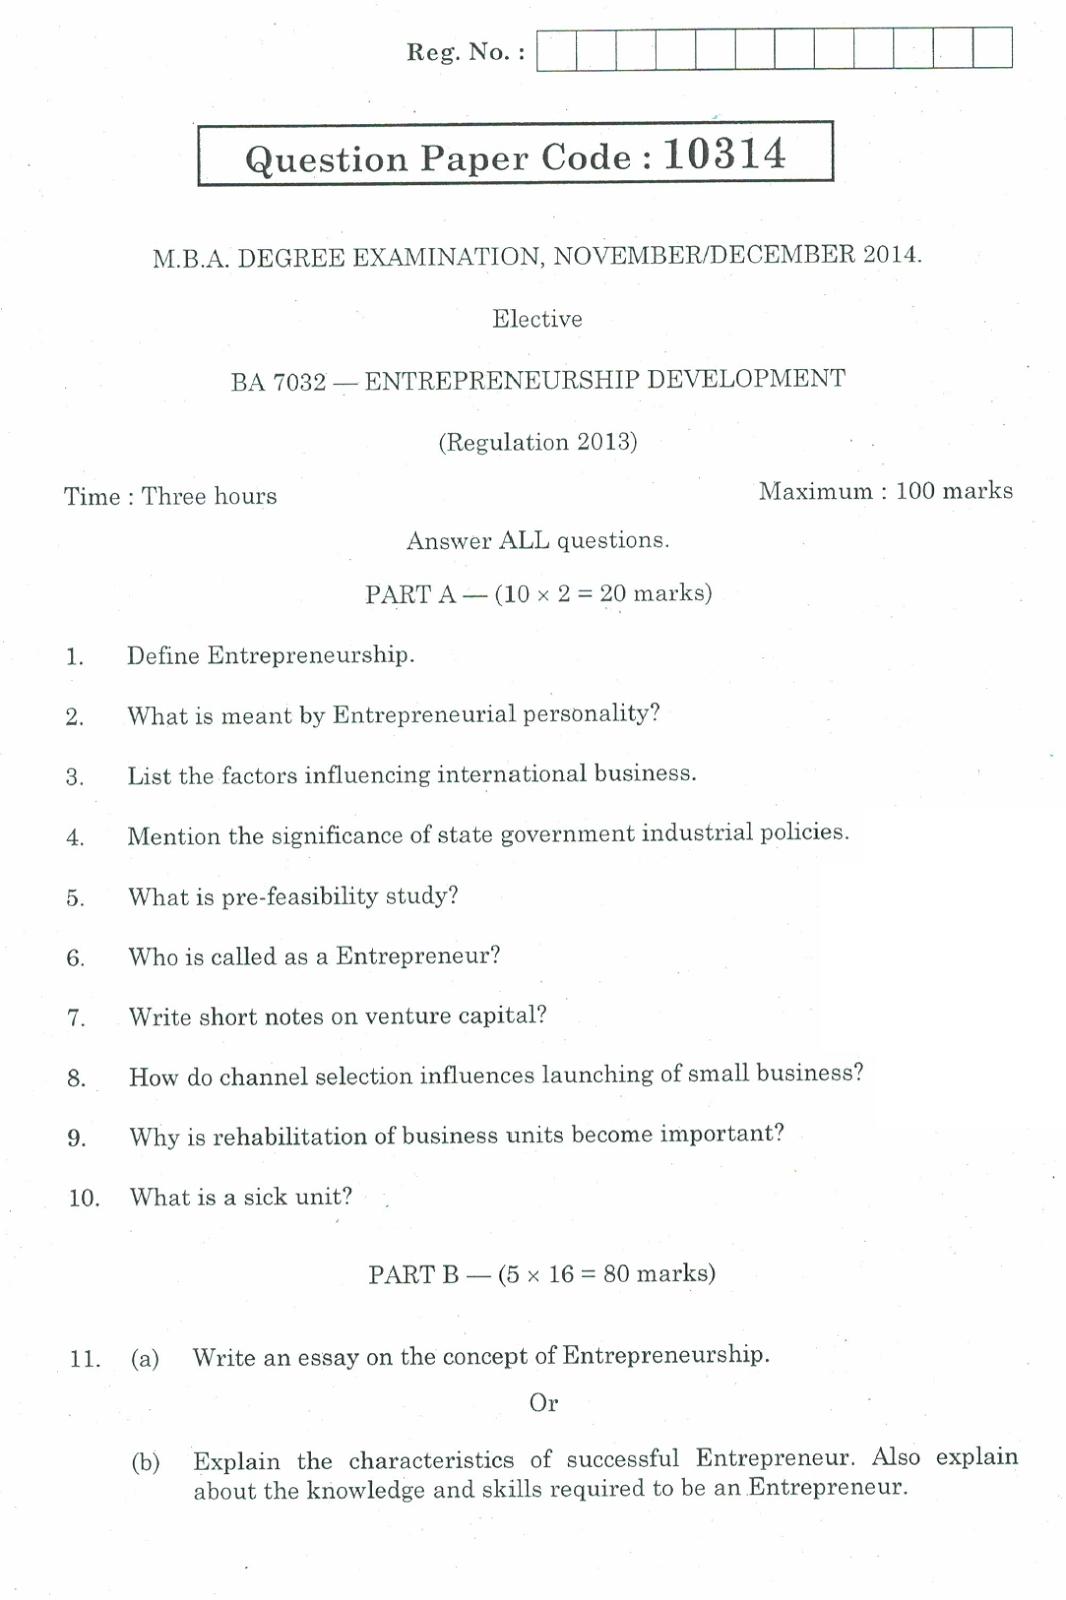 BA7032 - ENTREPRENEURSHIP DEVELOPMENT 2014 Question Paer